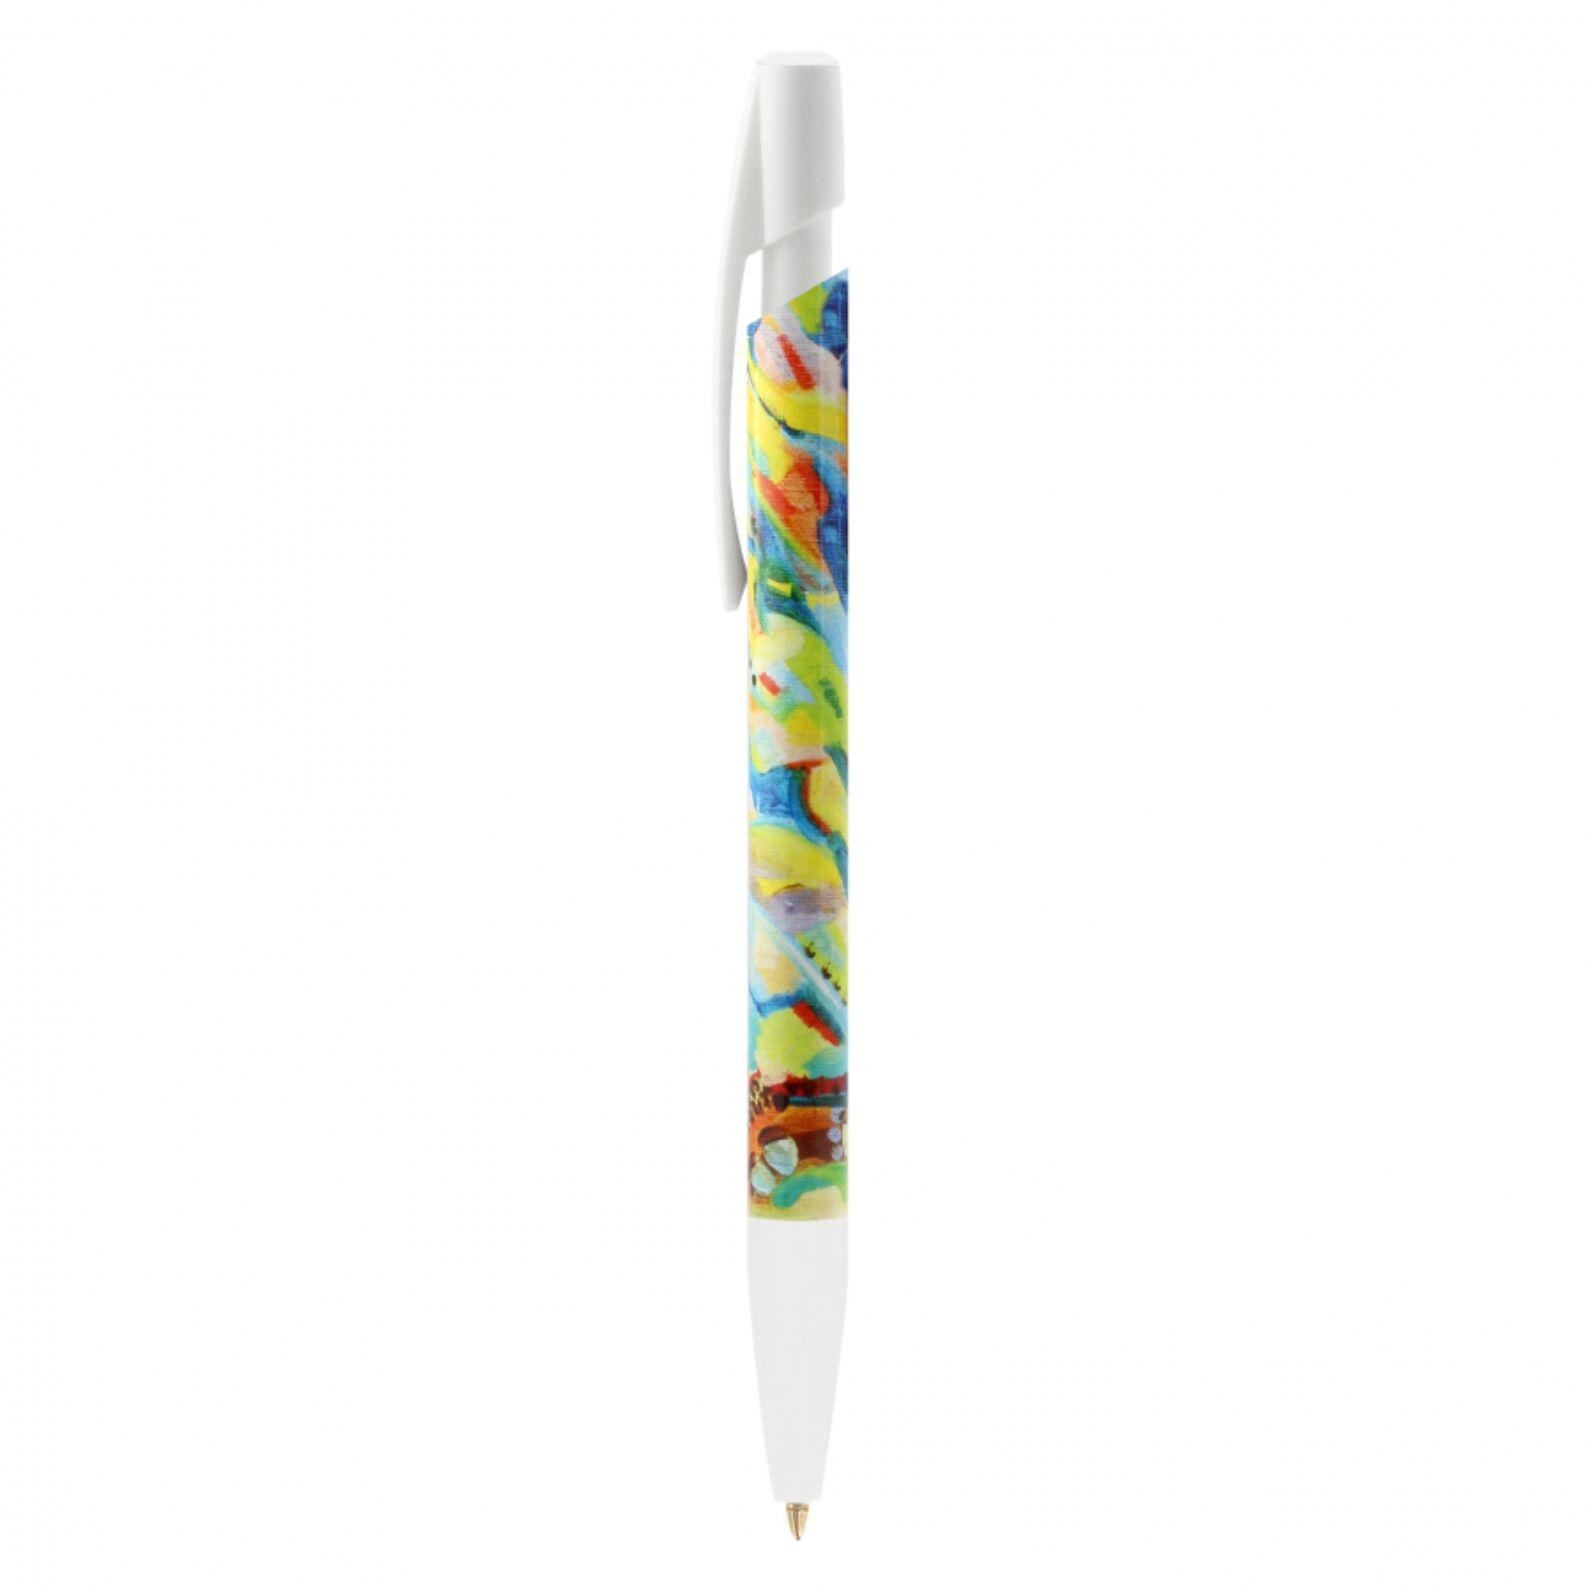 Kugelschreiber Bic® Media Clic Digital